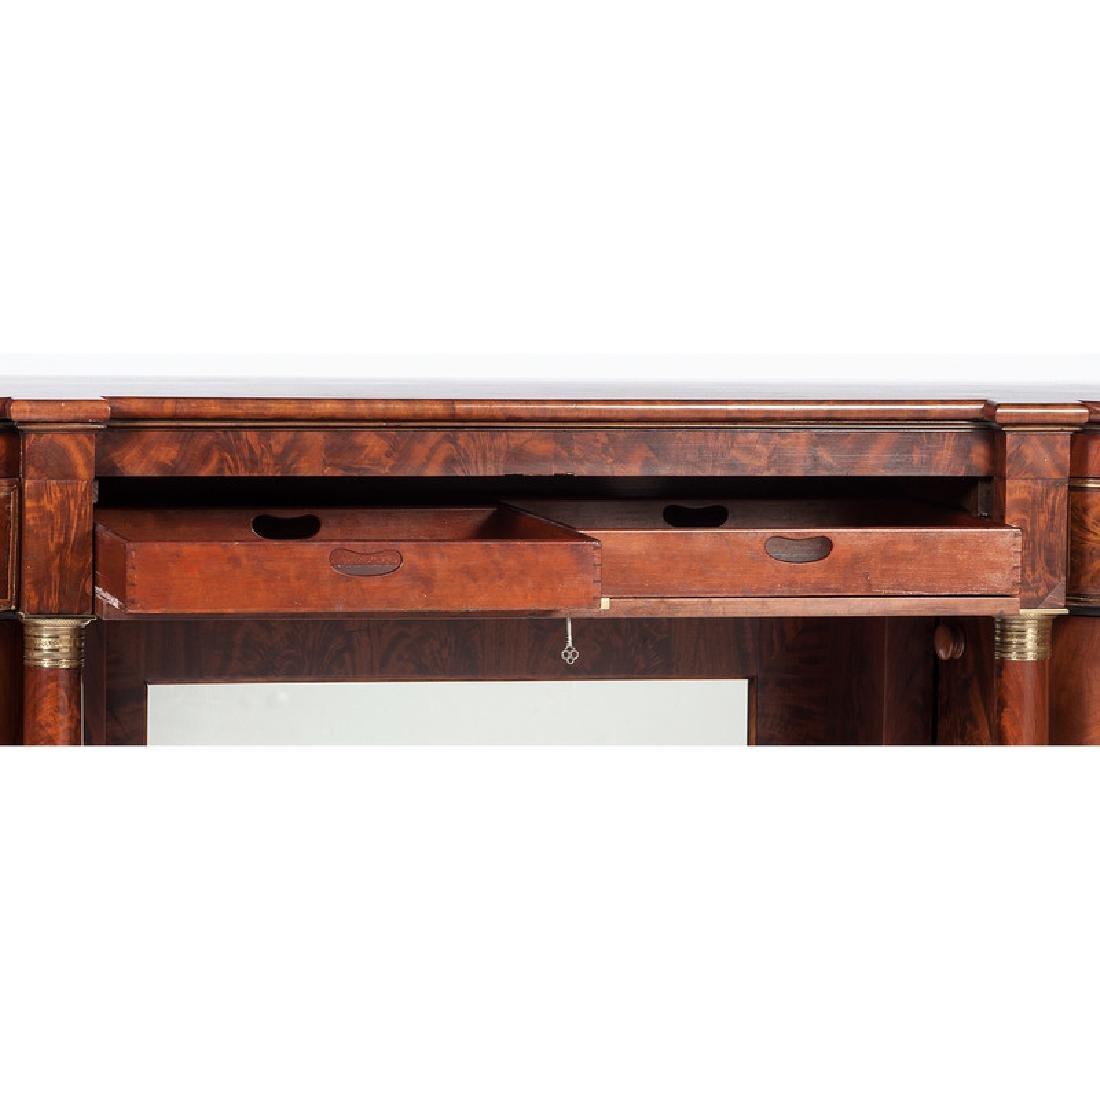 American Late Classical Sideboard - 4